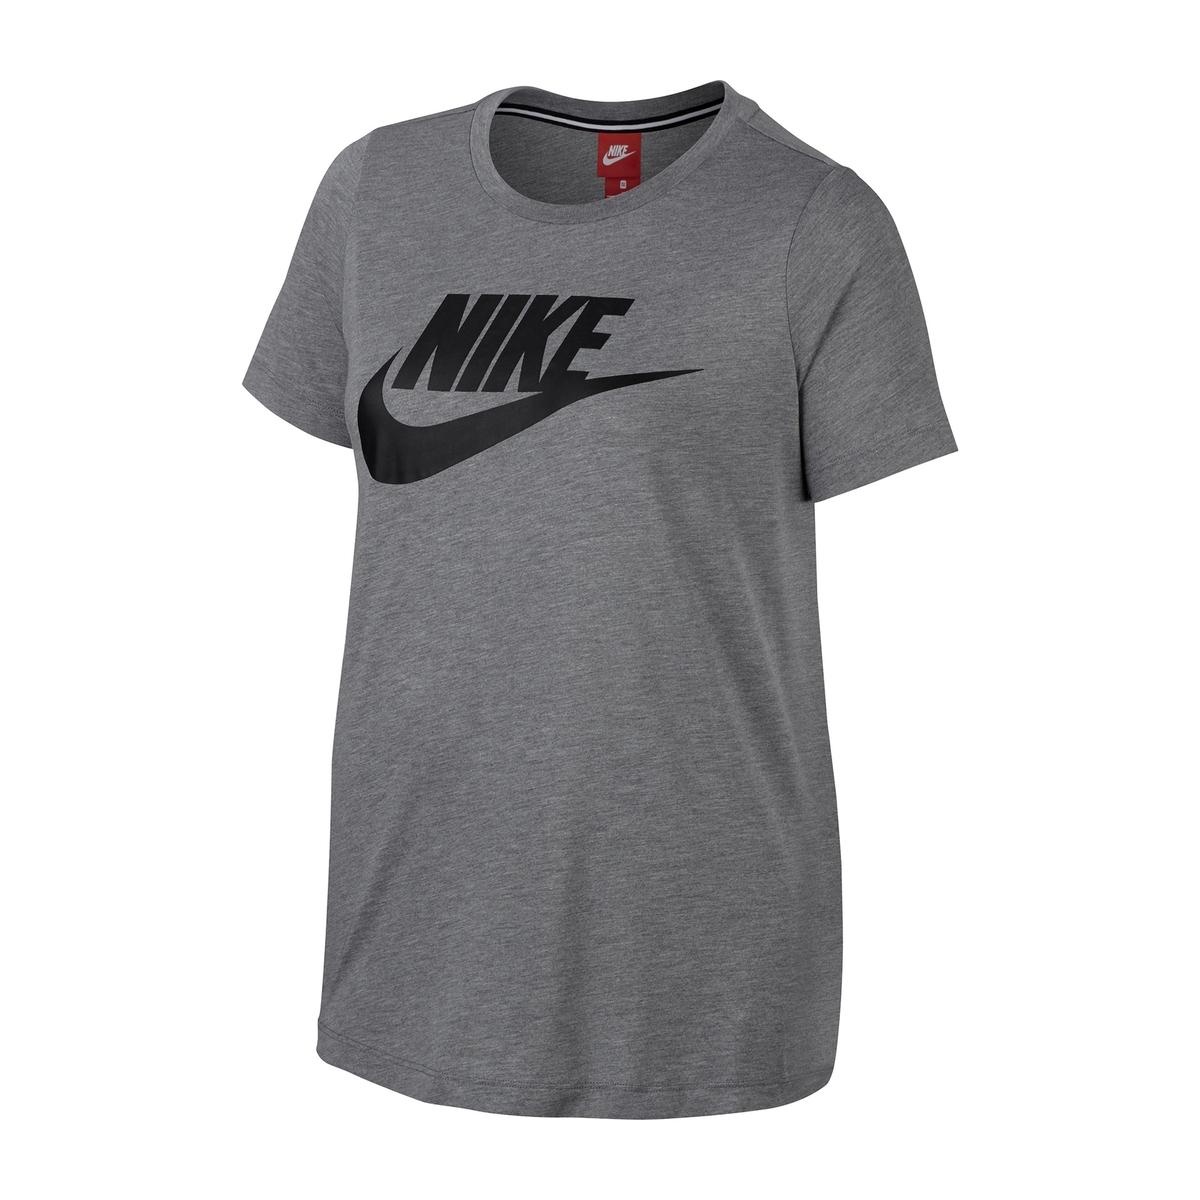 Camiseta con cuello redondo y manga corta